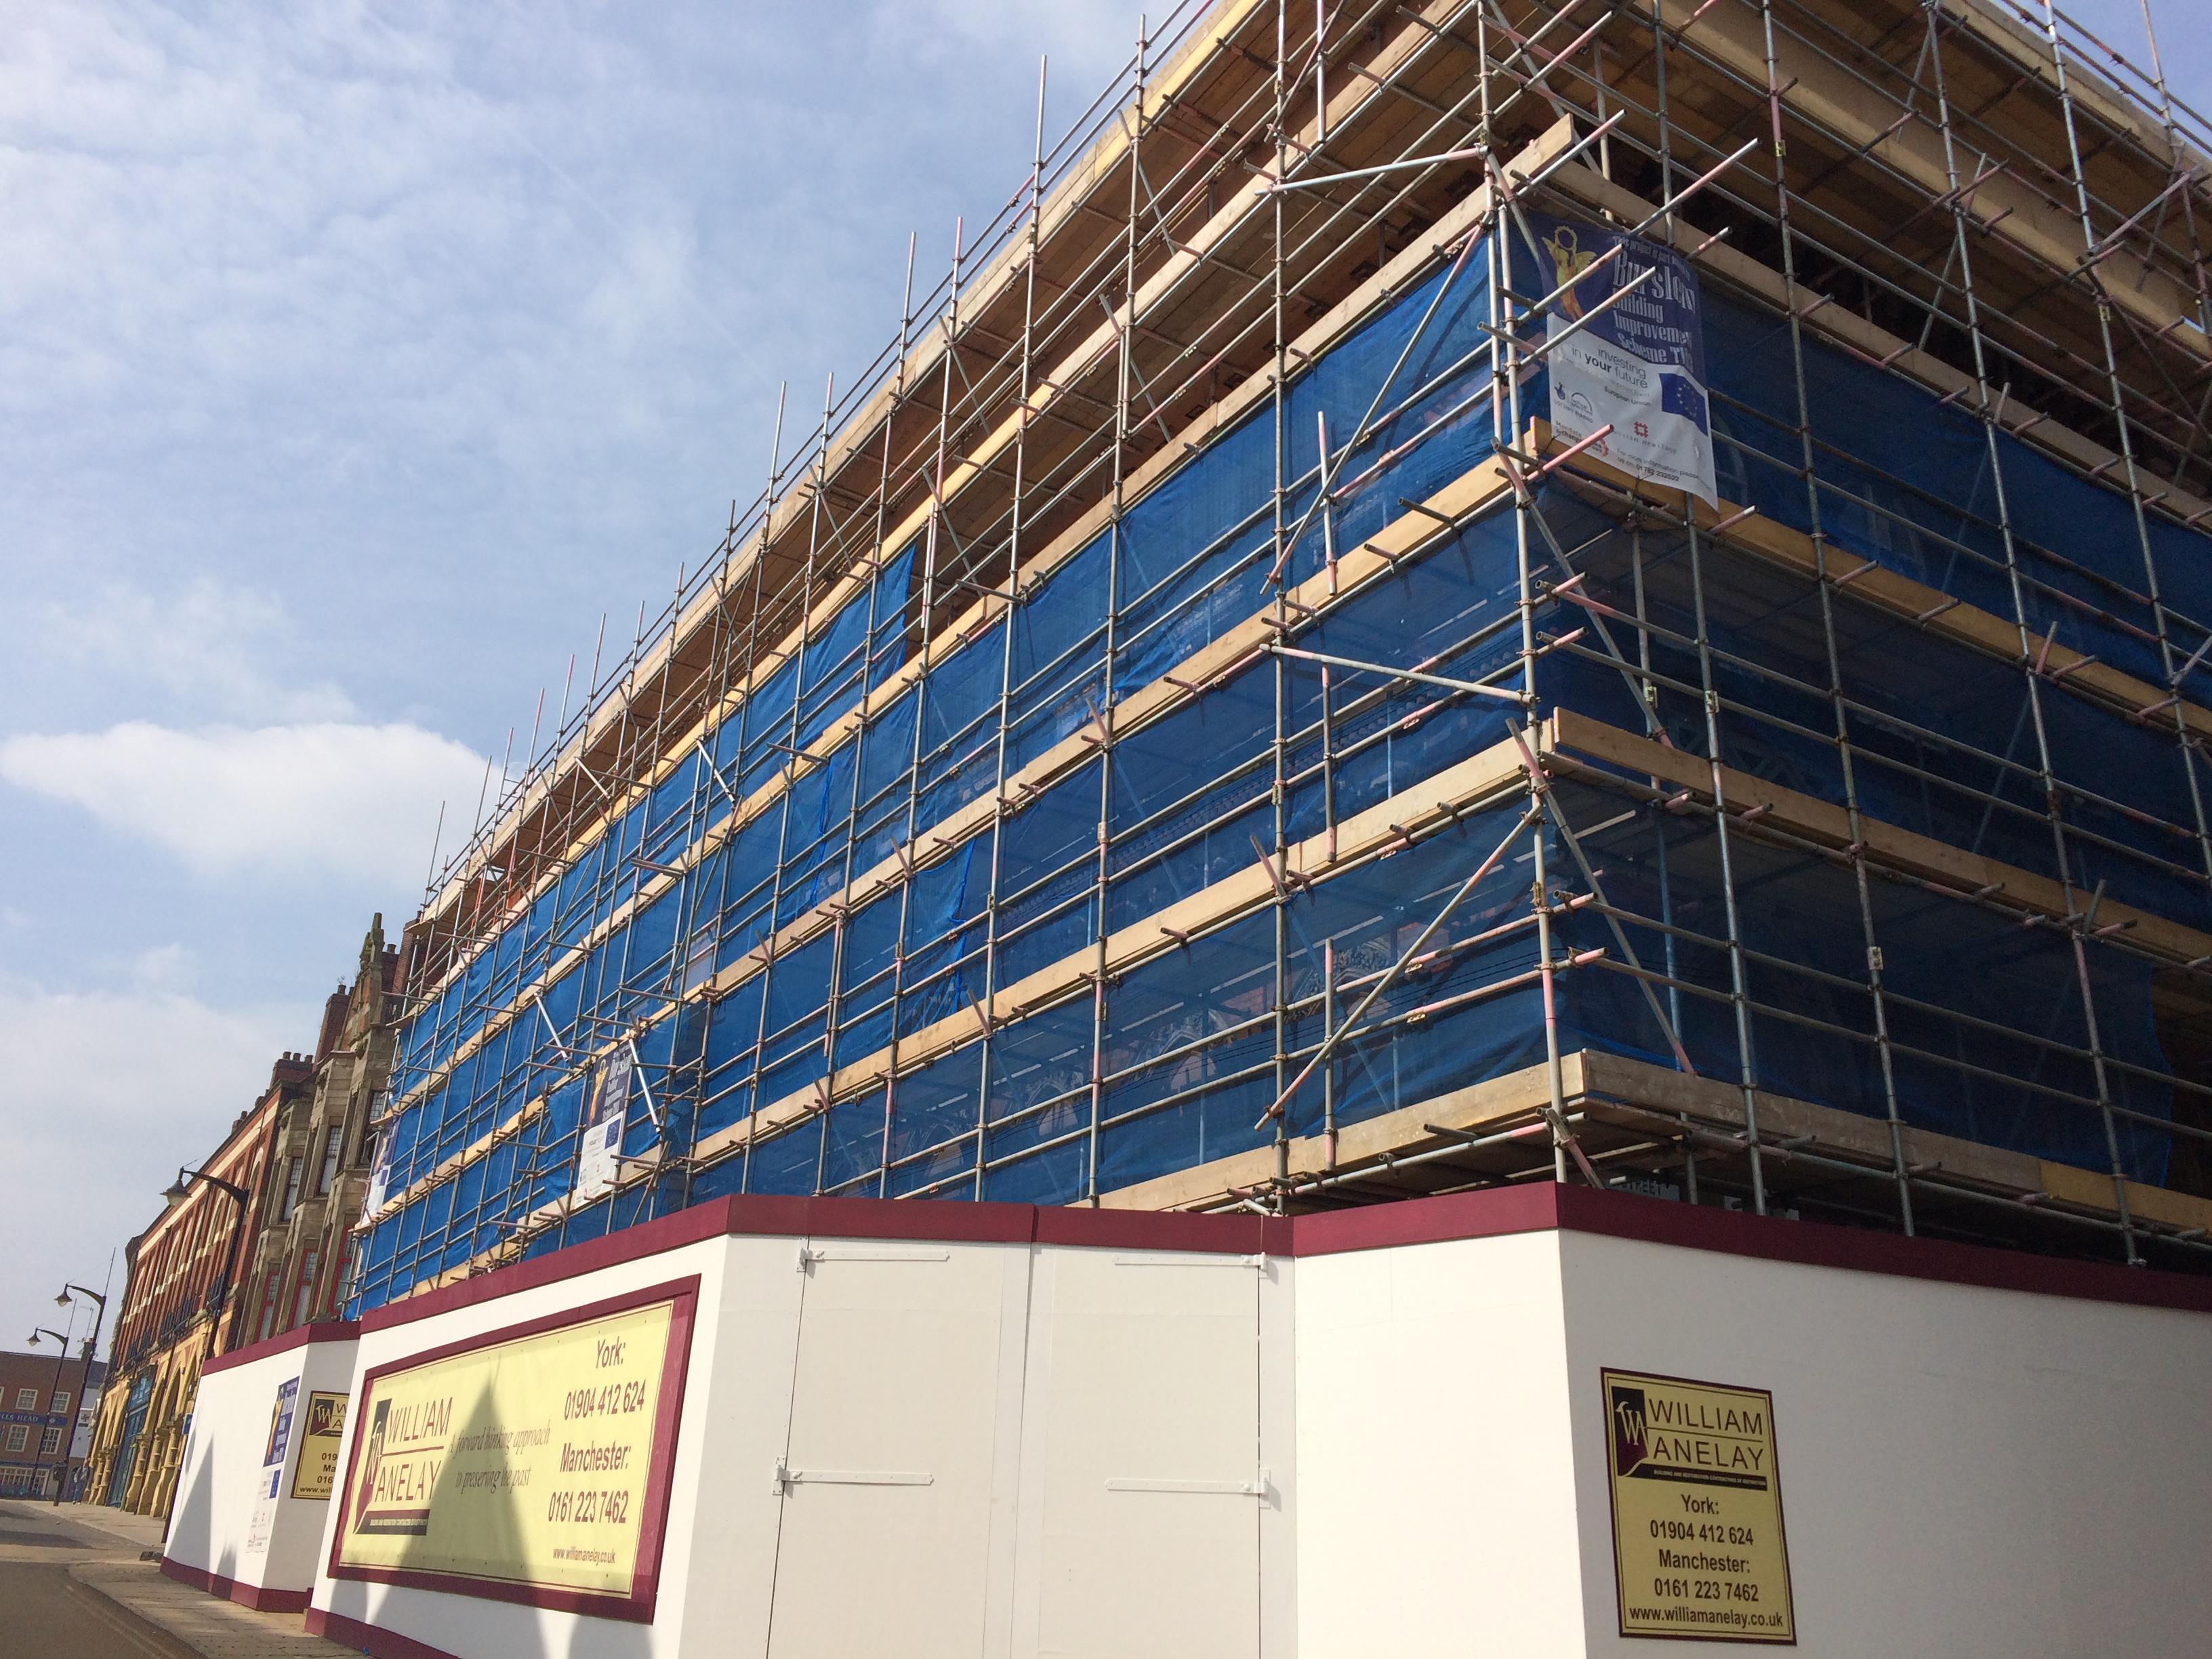 Leeds Access Company Ltd Access Provision Contractors To